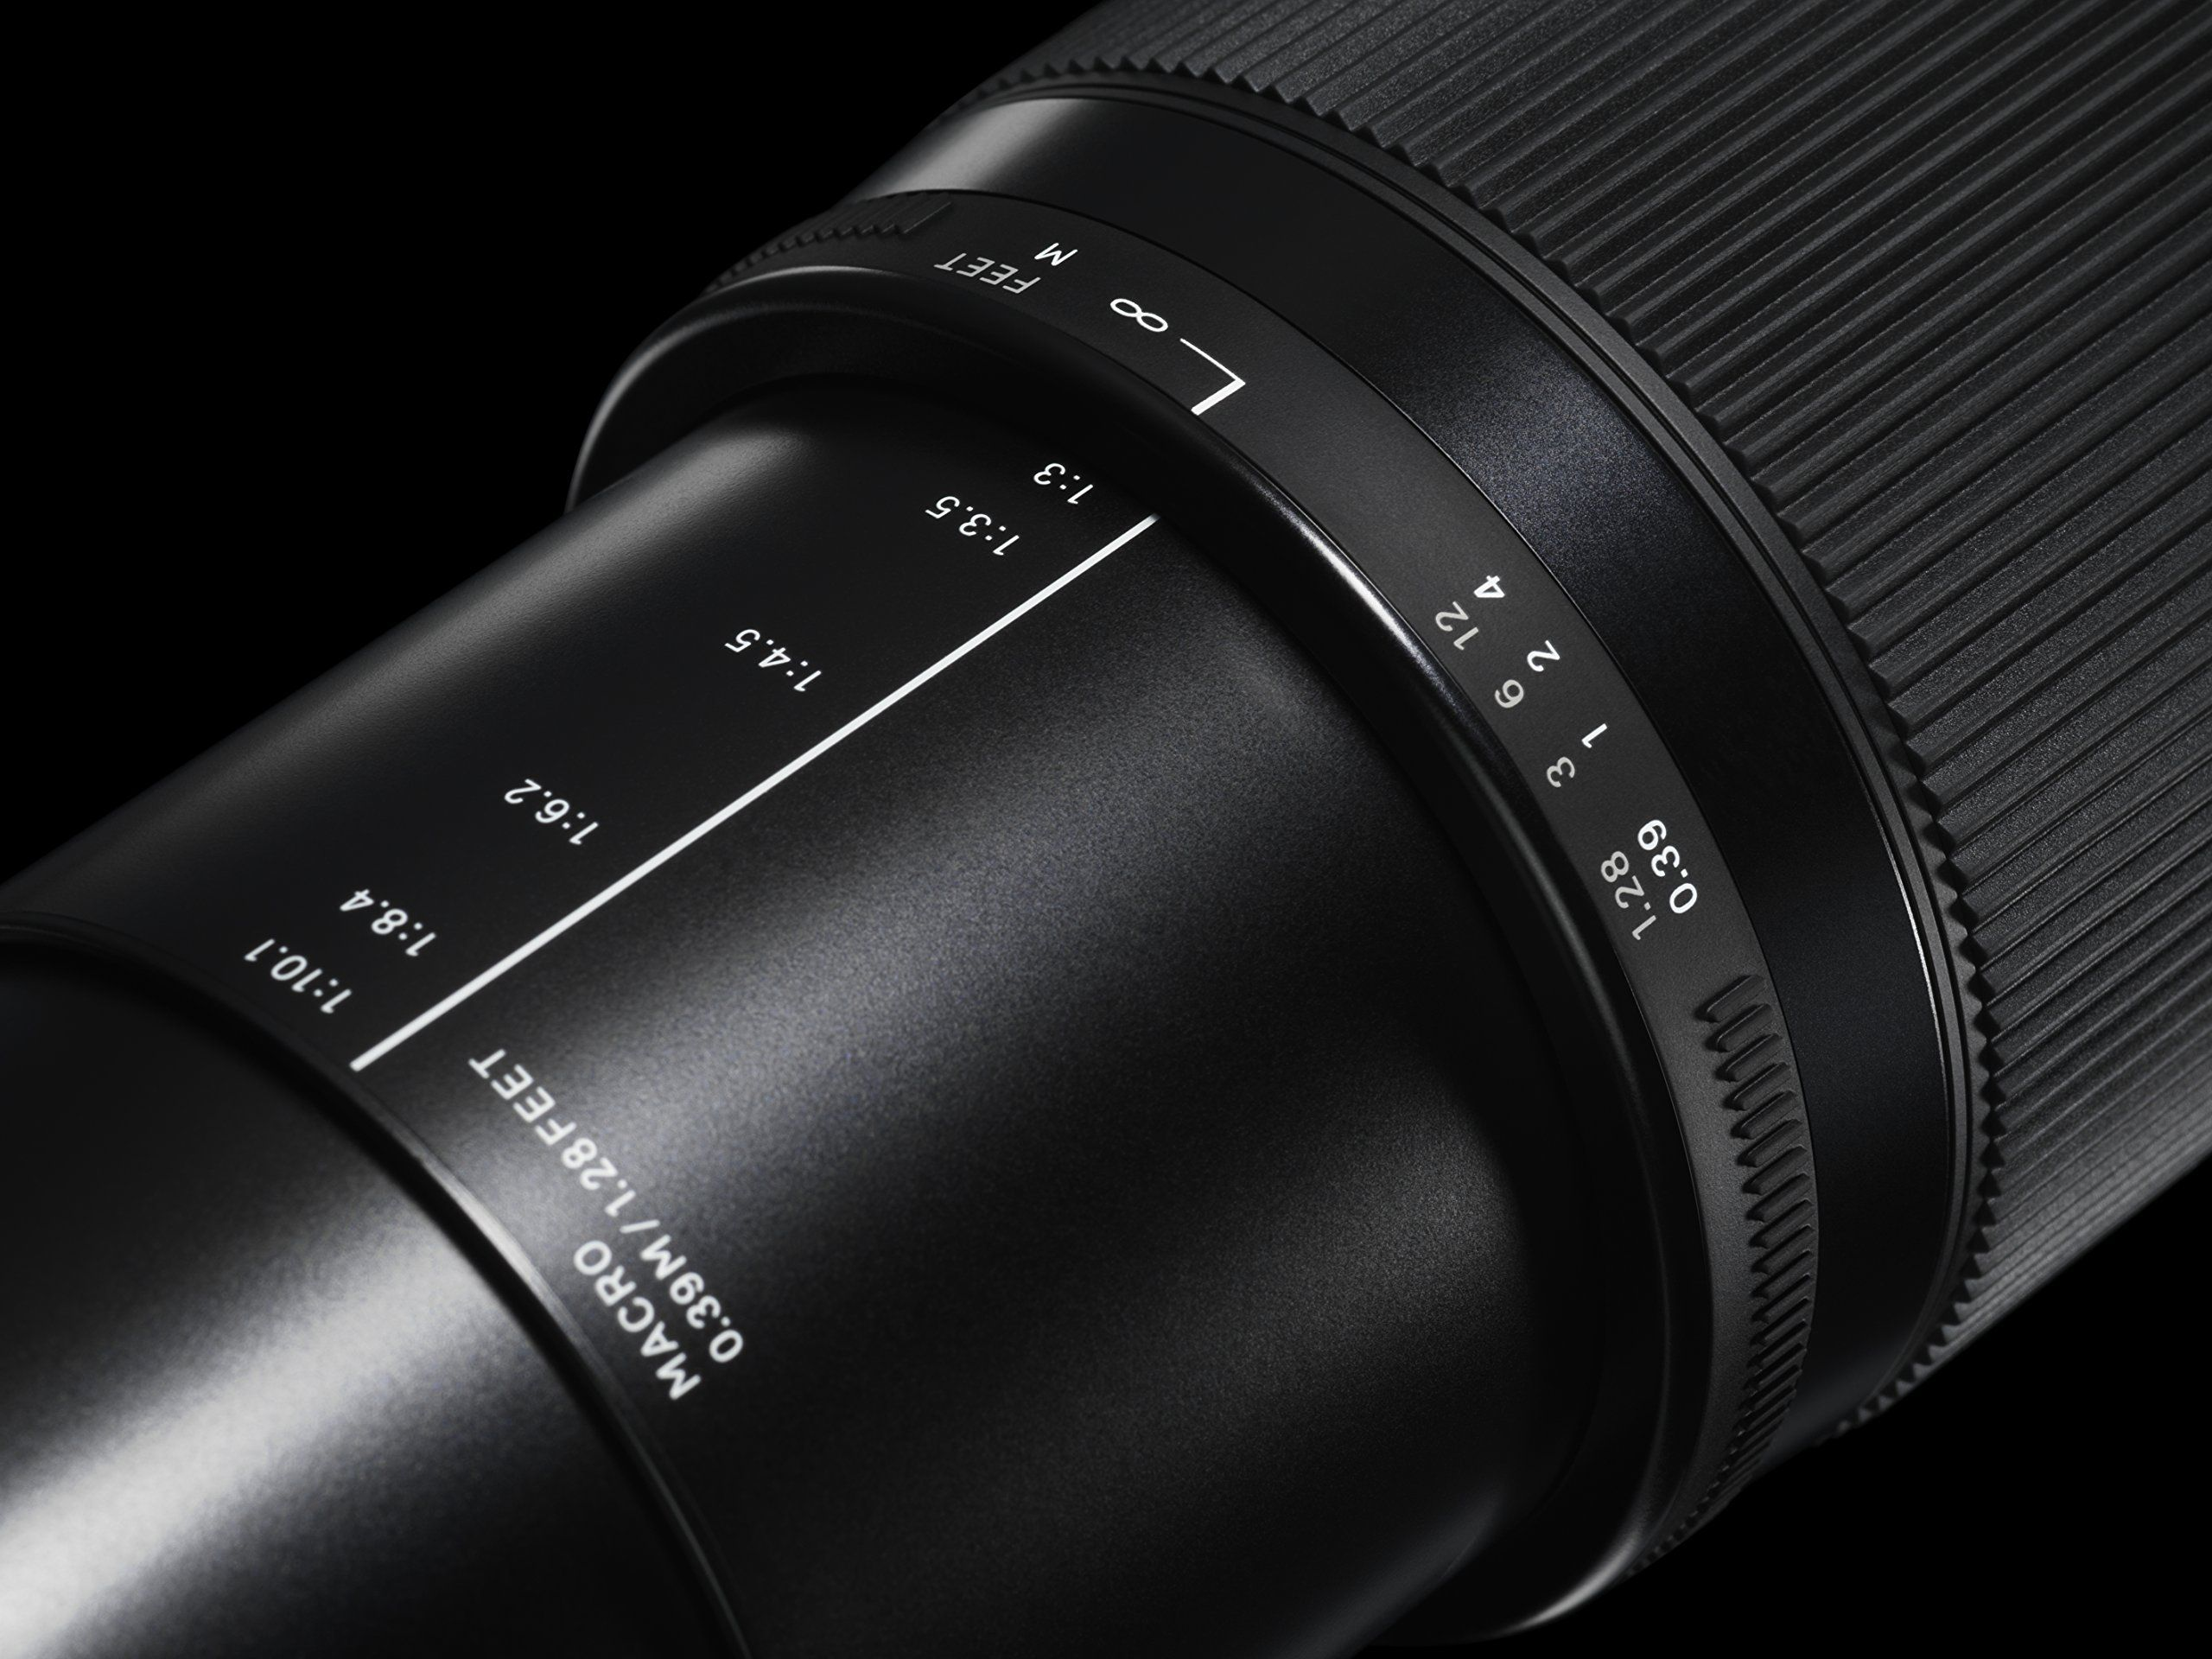 Sigma 886101 18 300mm F3 5 6 3 Dc Macro Os Hsm Lens For Canon Canon Lens Sigma Lenses Lens